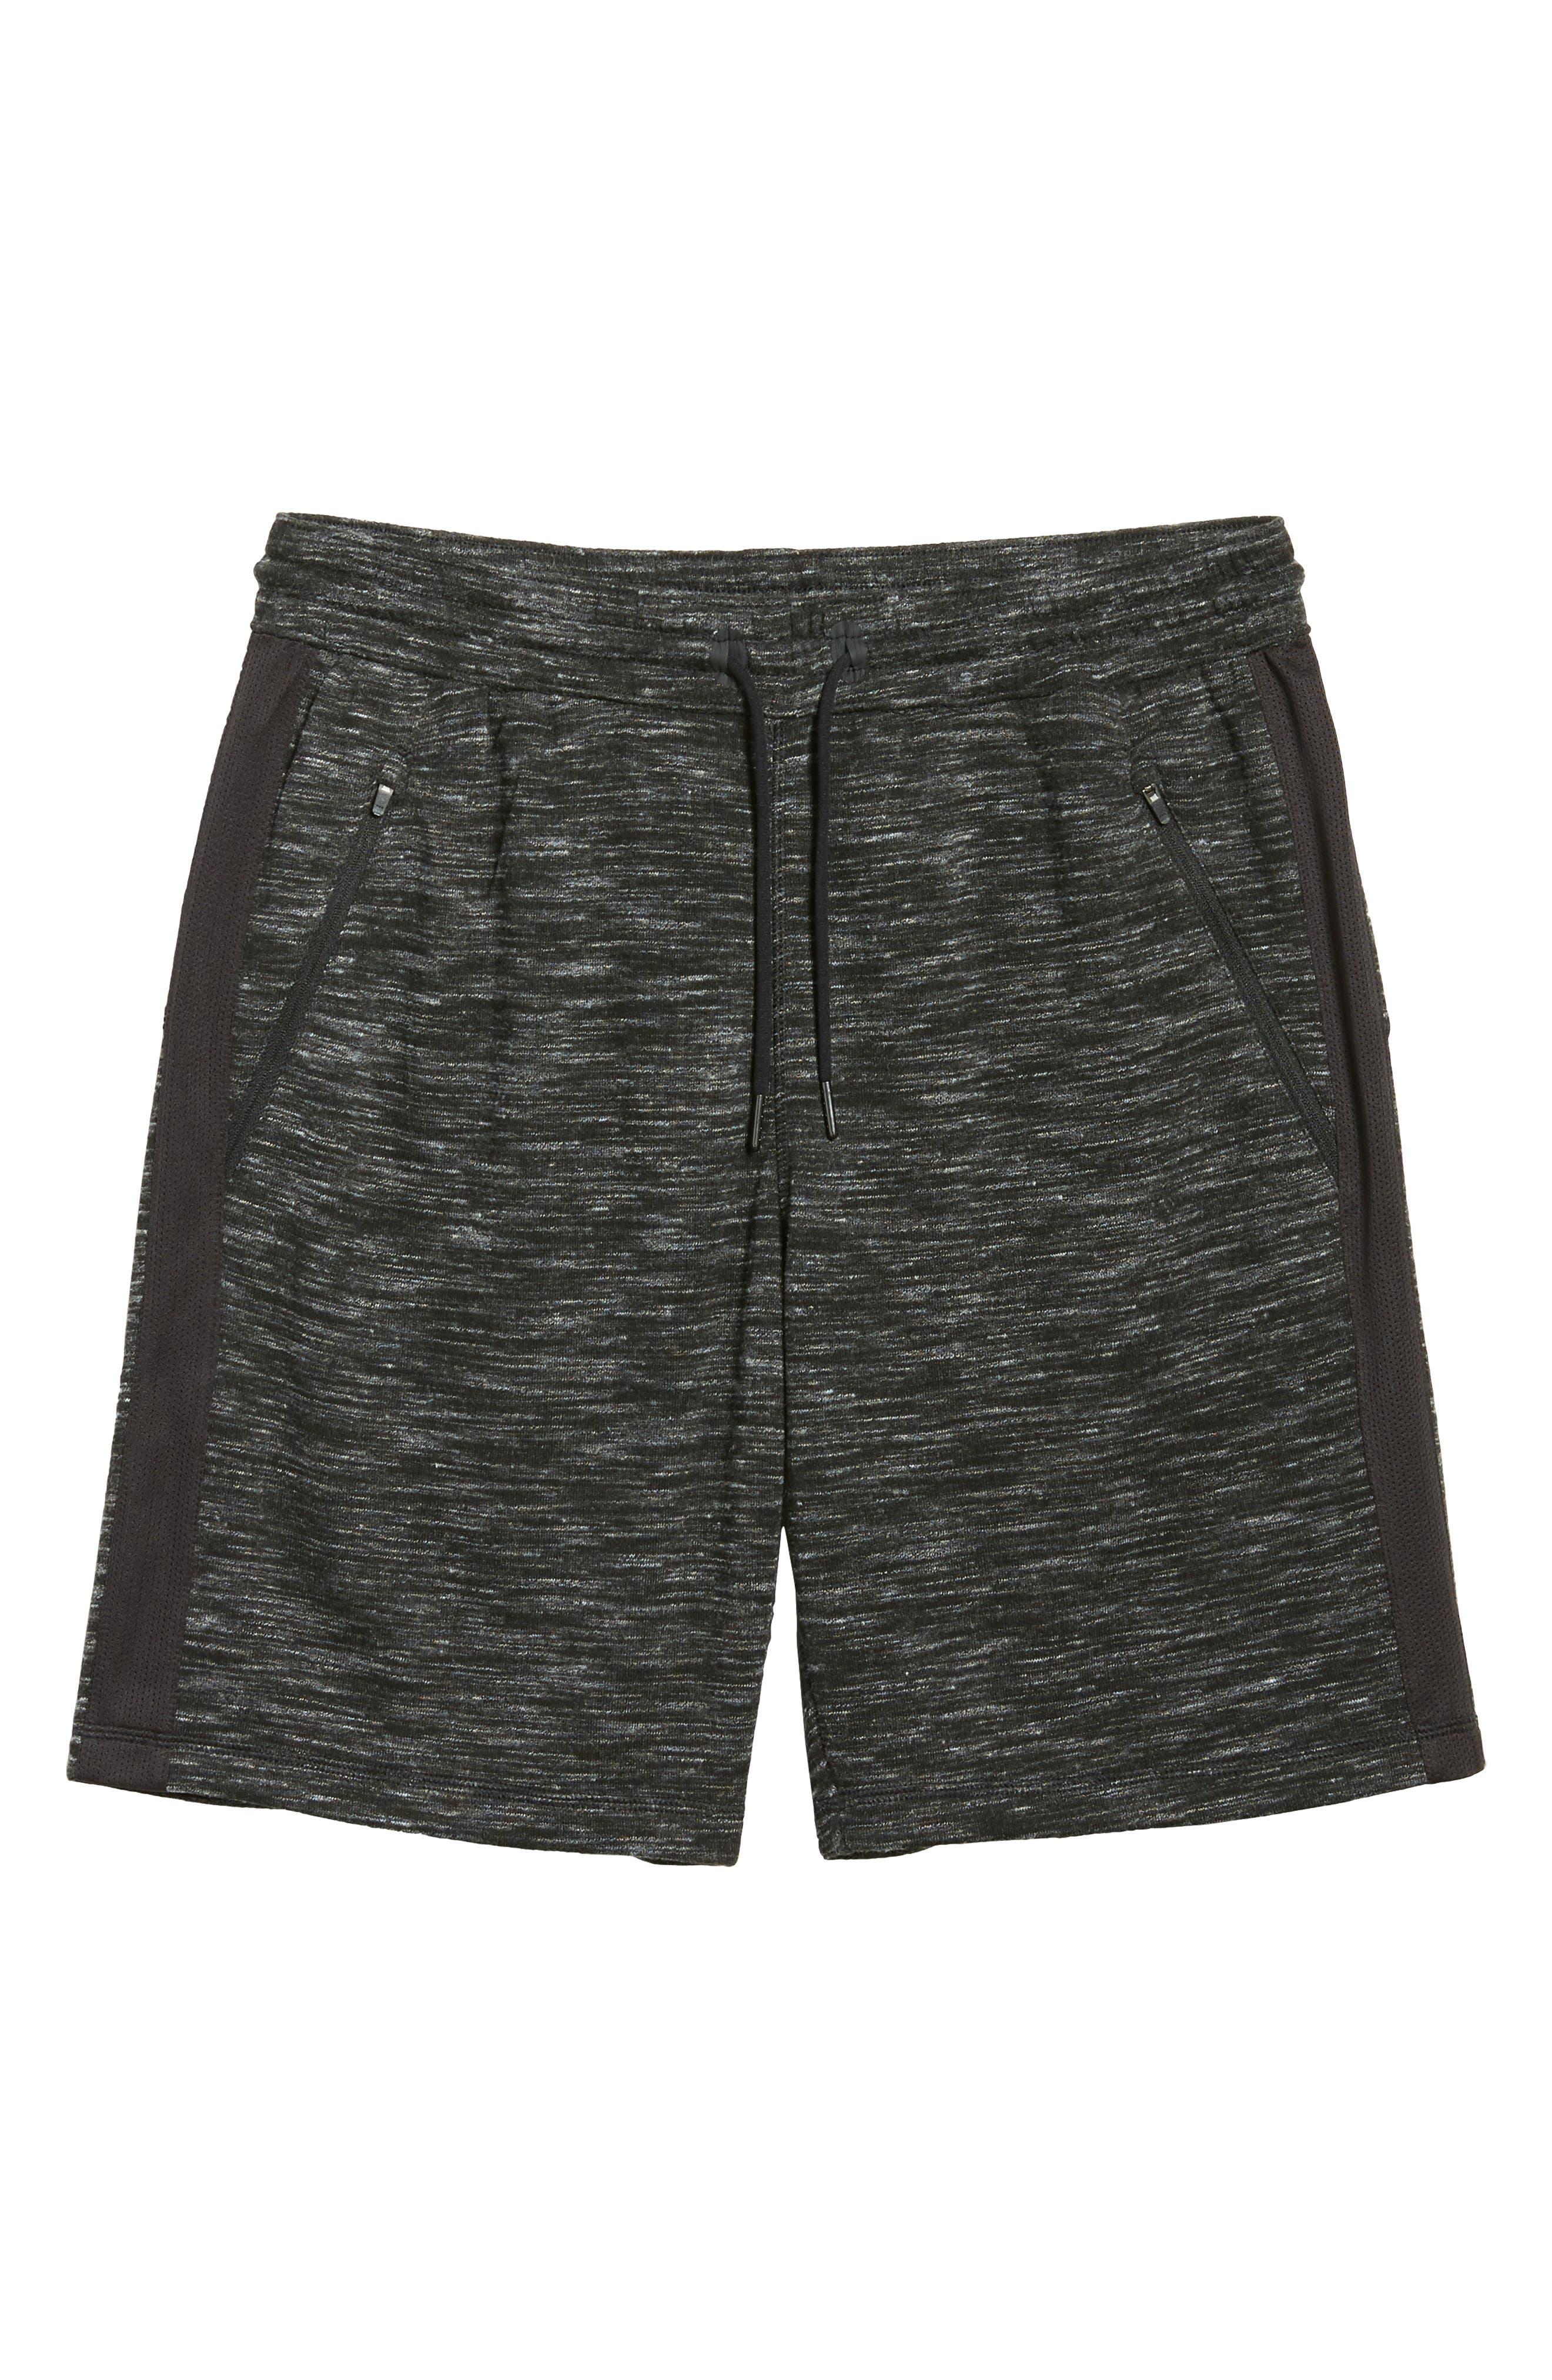 Neptune Terrycloth Shorts,                             Alternate thumbnail 6, color,                             Black Oxide Melange